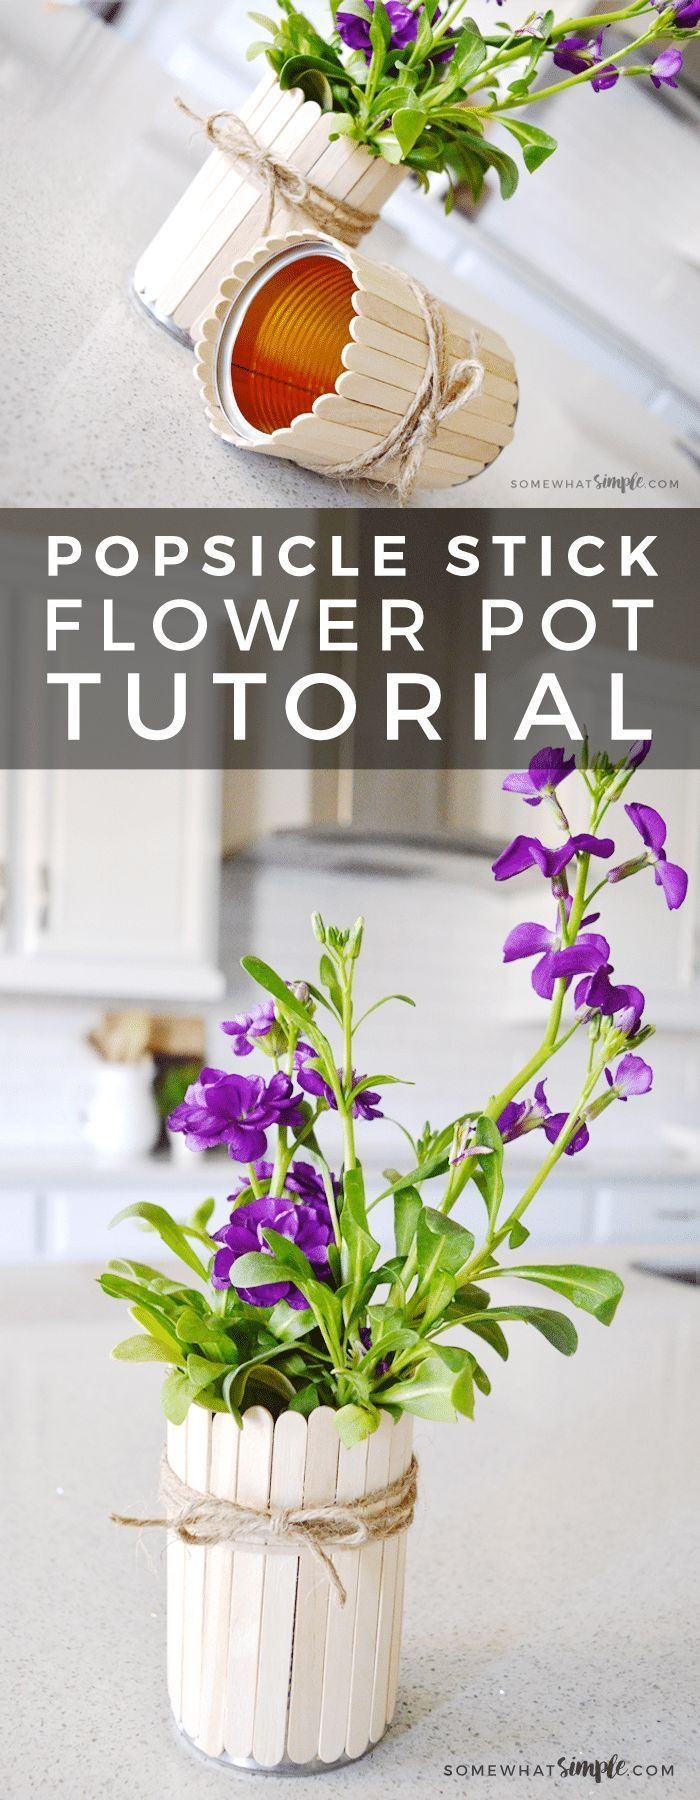 Photo of Popsicle Stick Flower Pots Tutorial